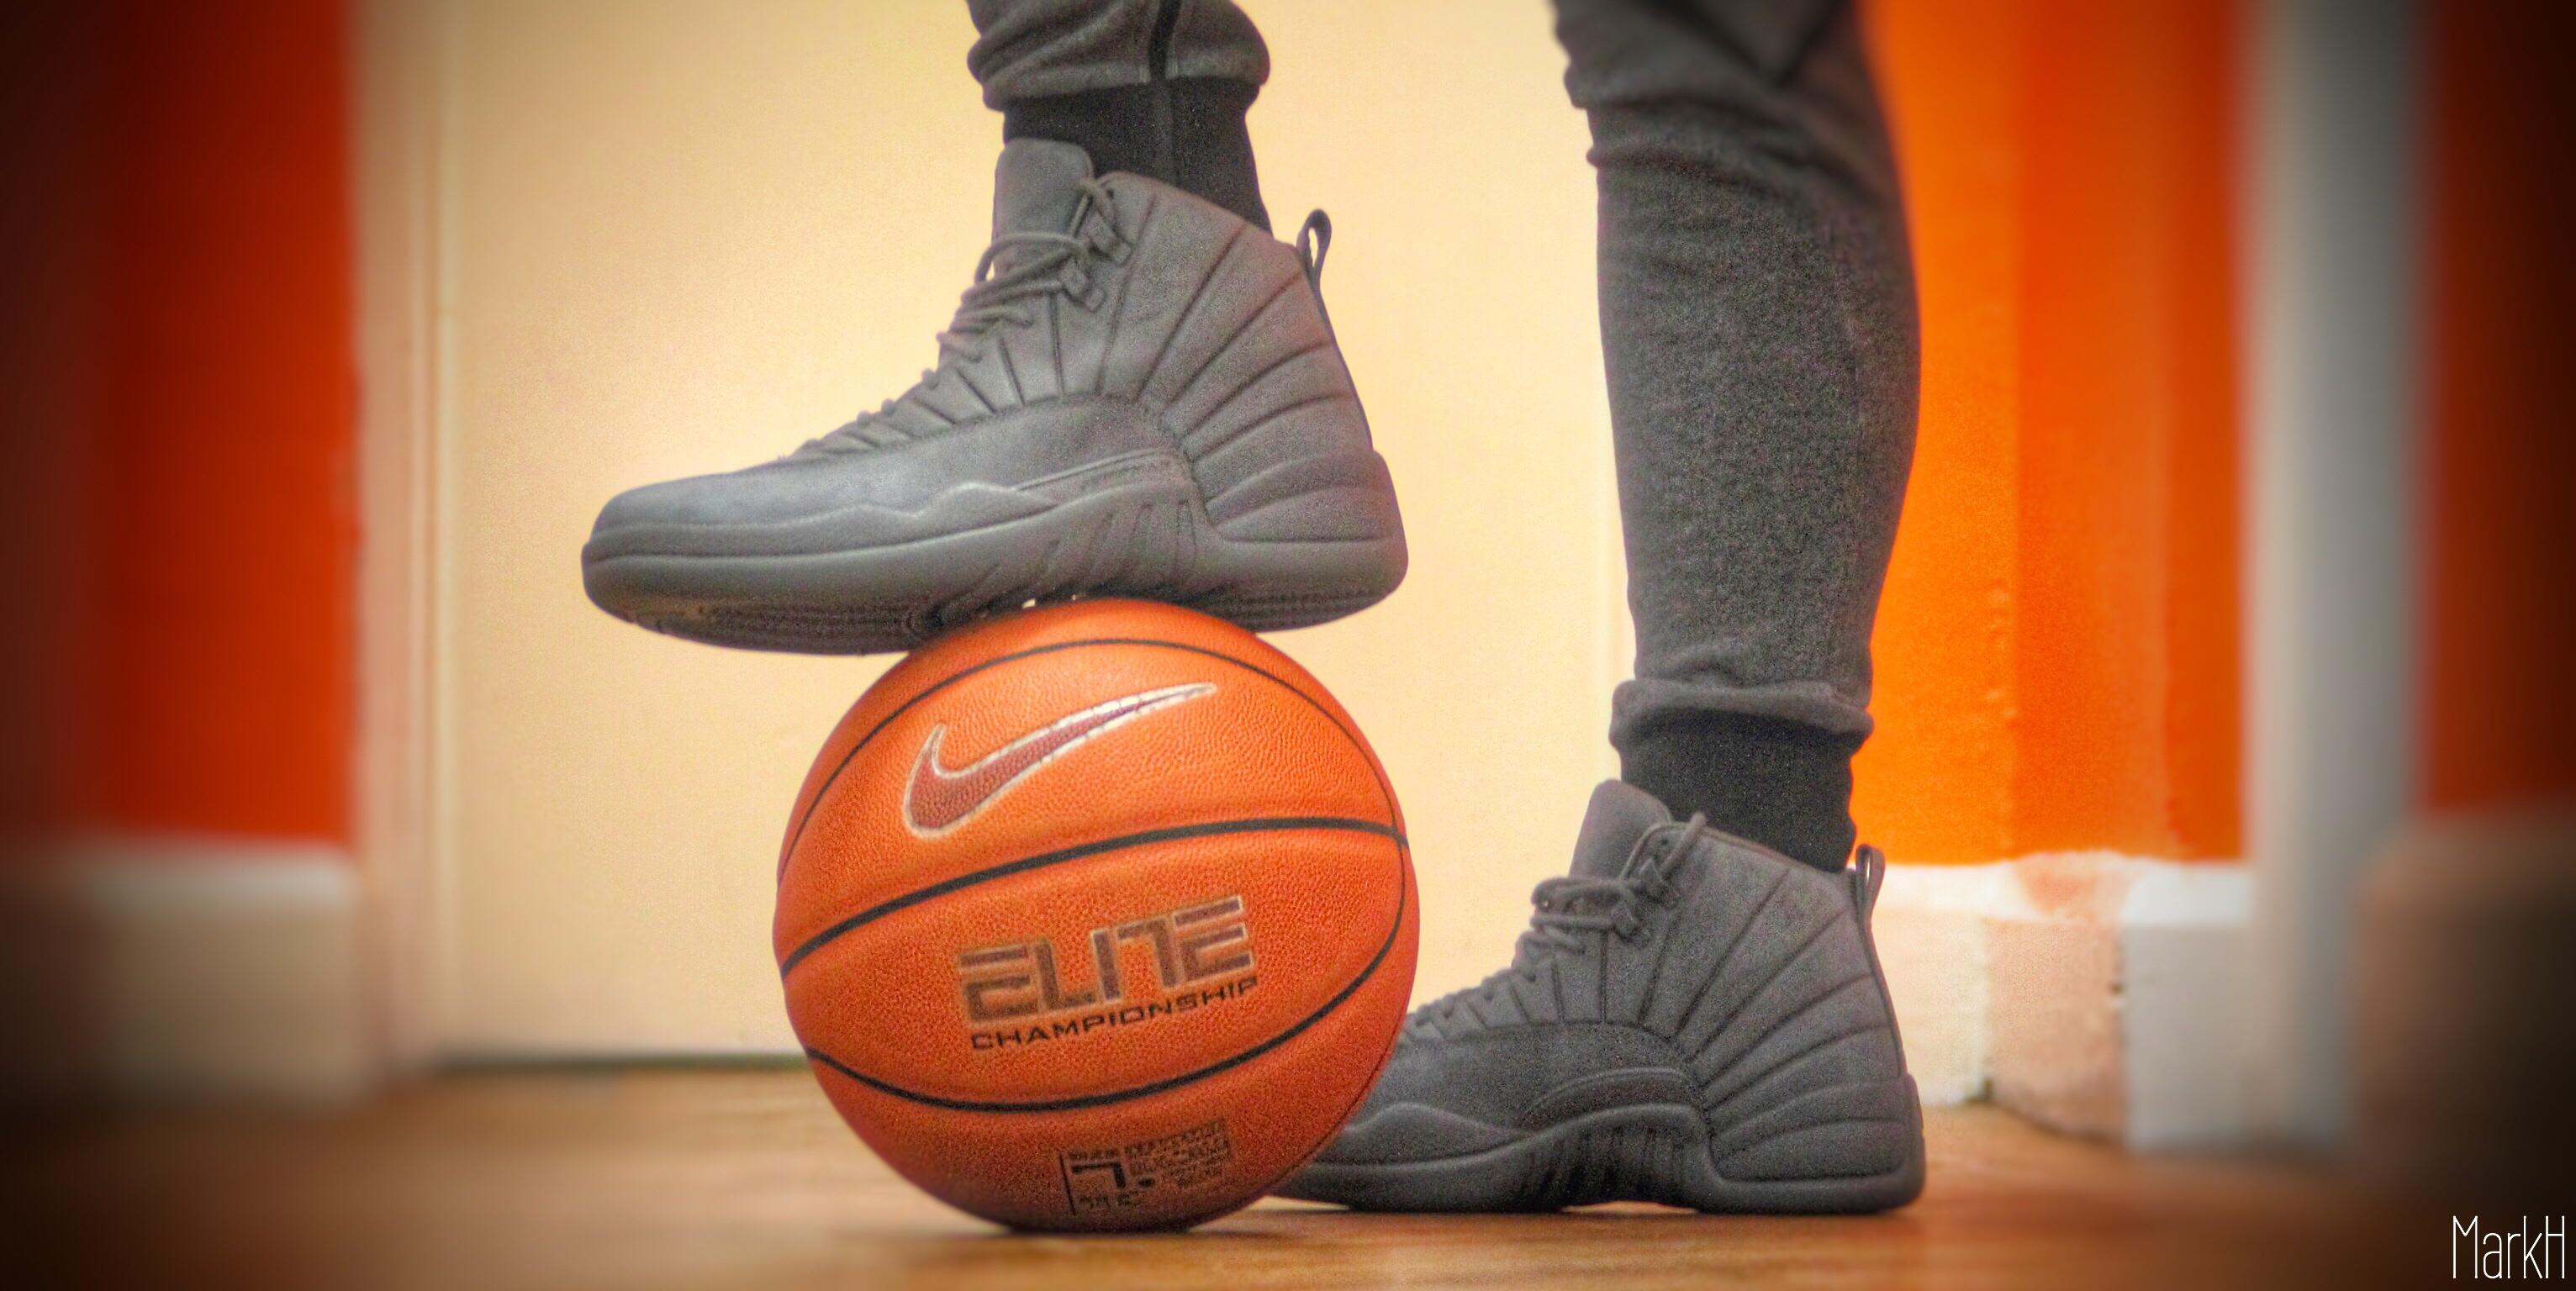 Wallpaper Nike Sport Love Indoors Fire Canon Orange Shoes